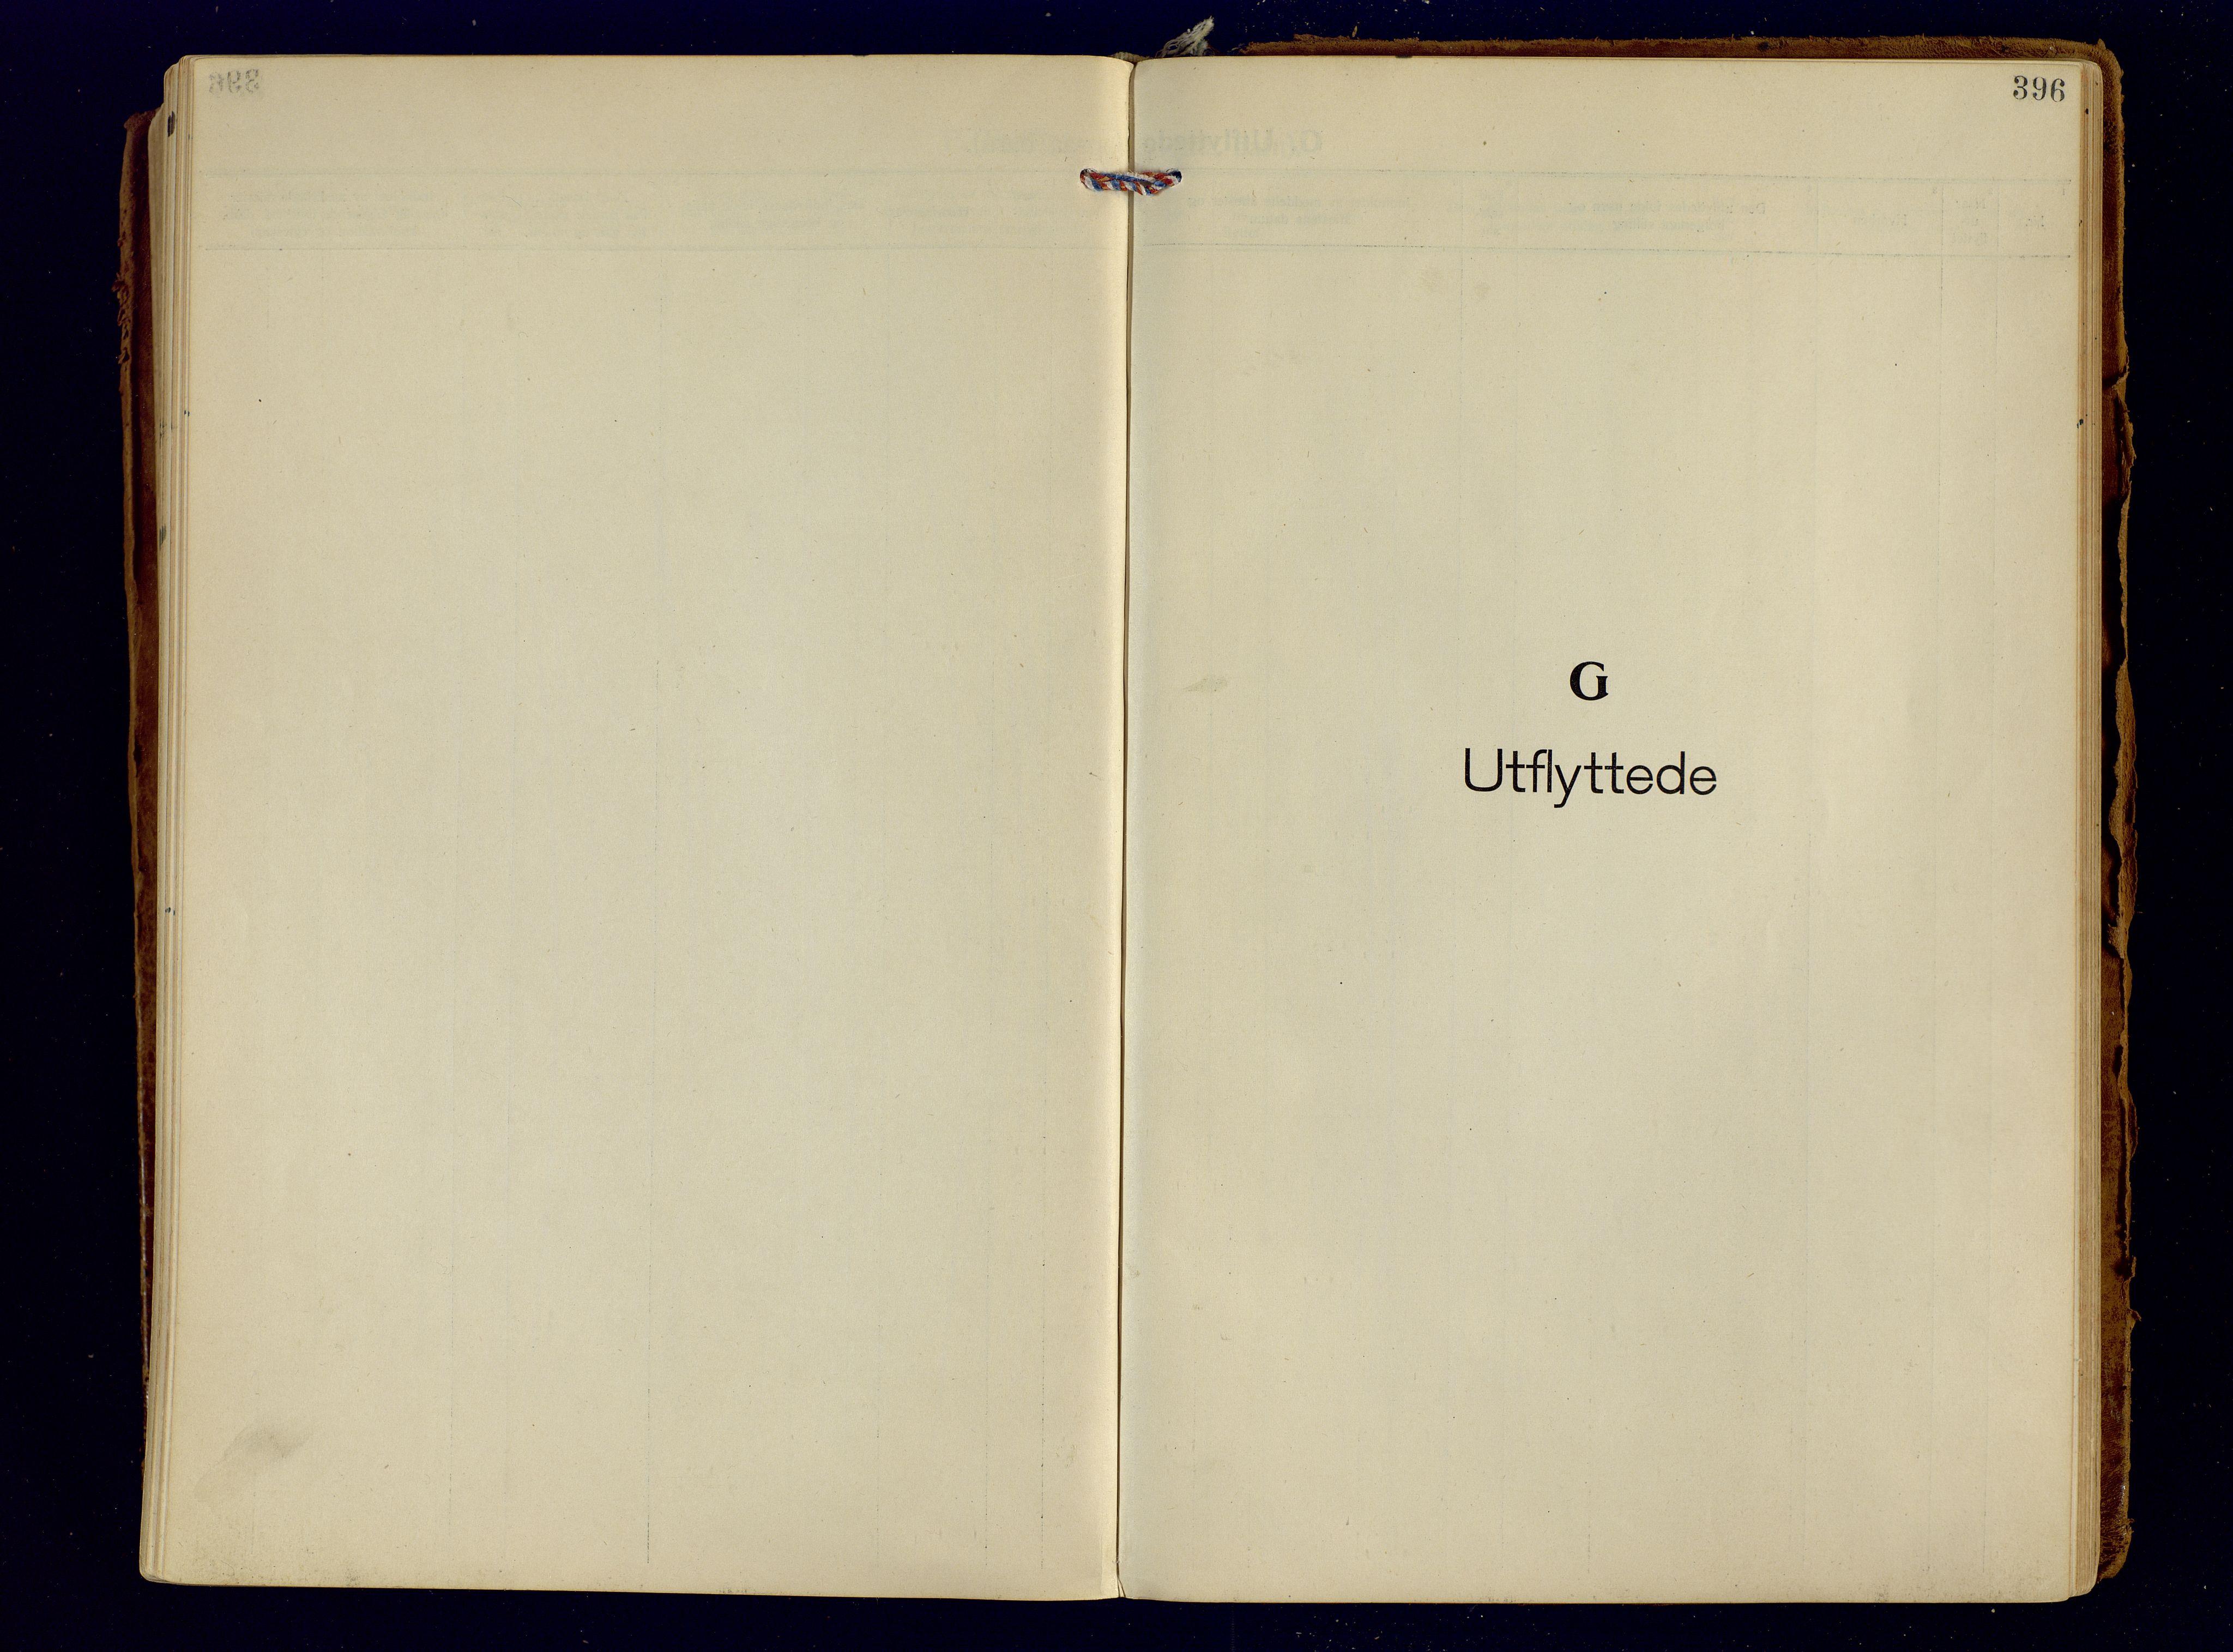 SATØ, Tromsøysund sokneprestkontor, G/Ga: Ministerialbok nr. 9, 1922-1934, s. 396